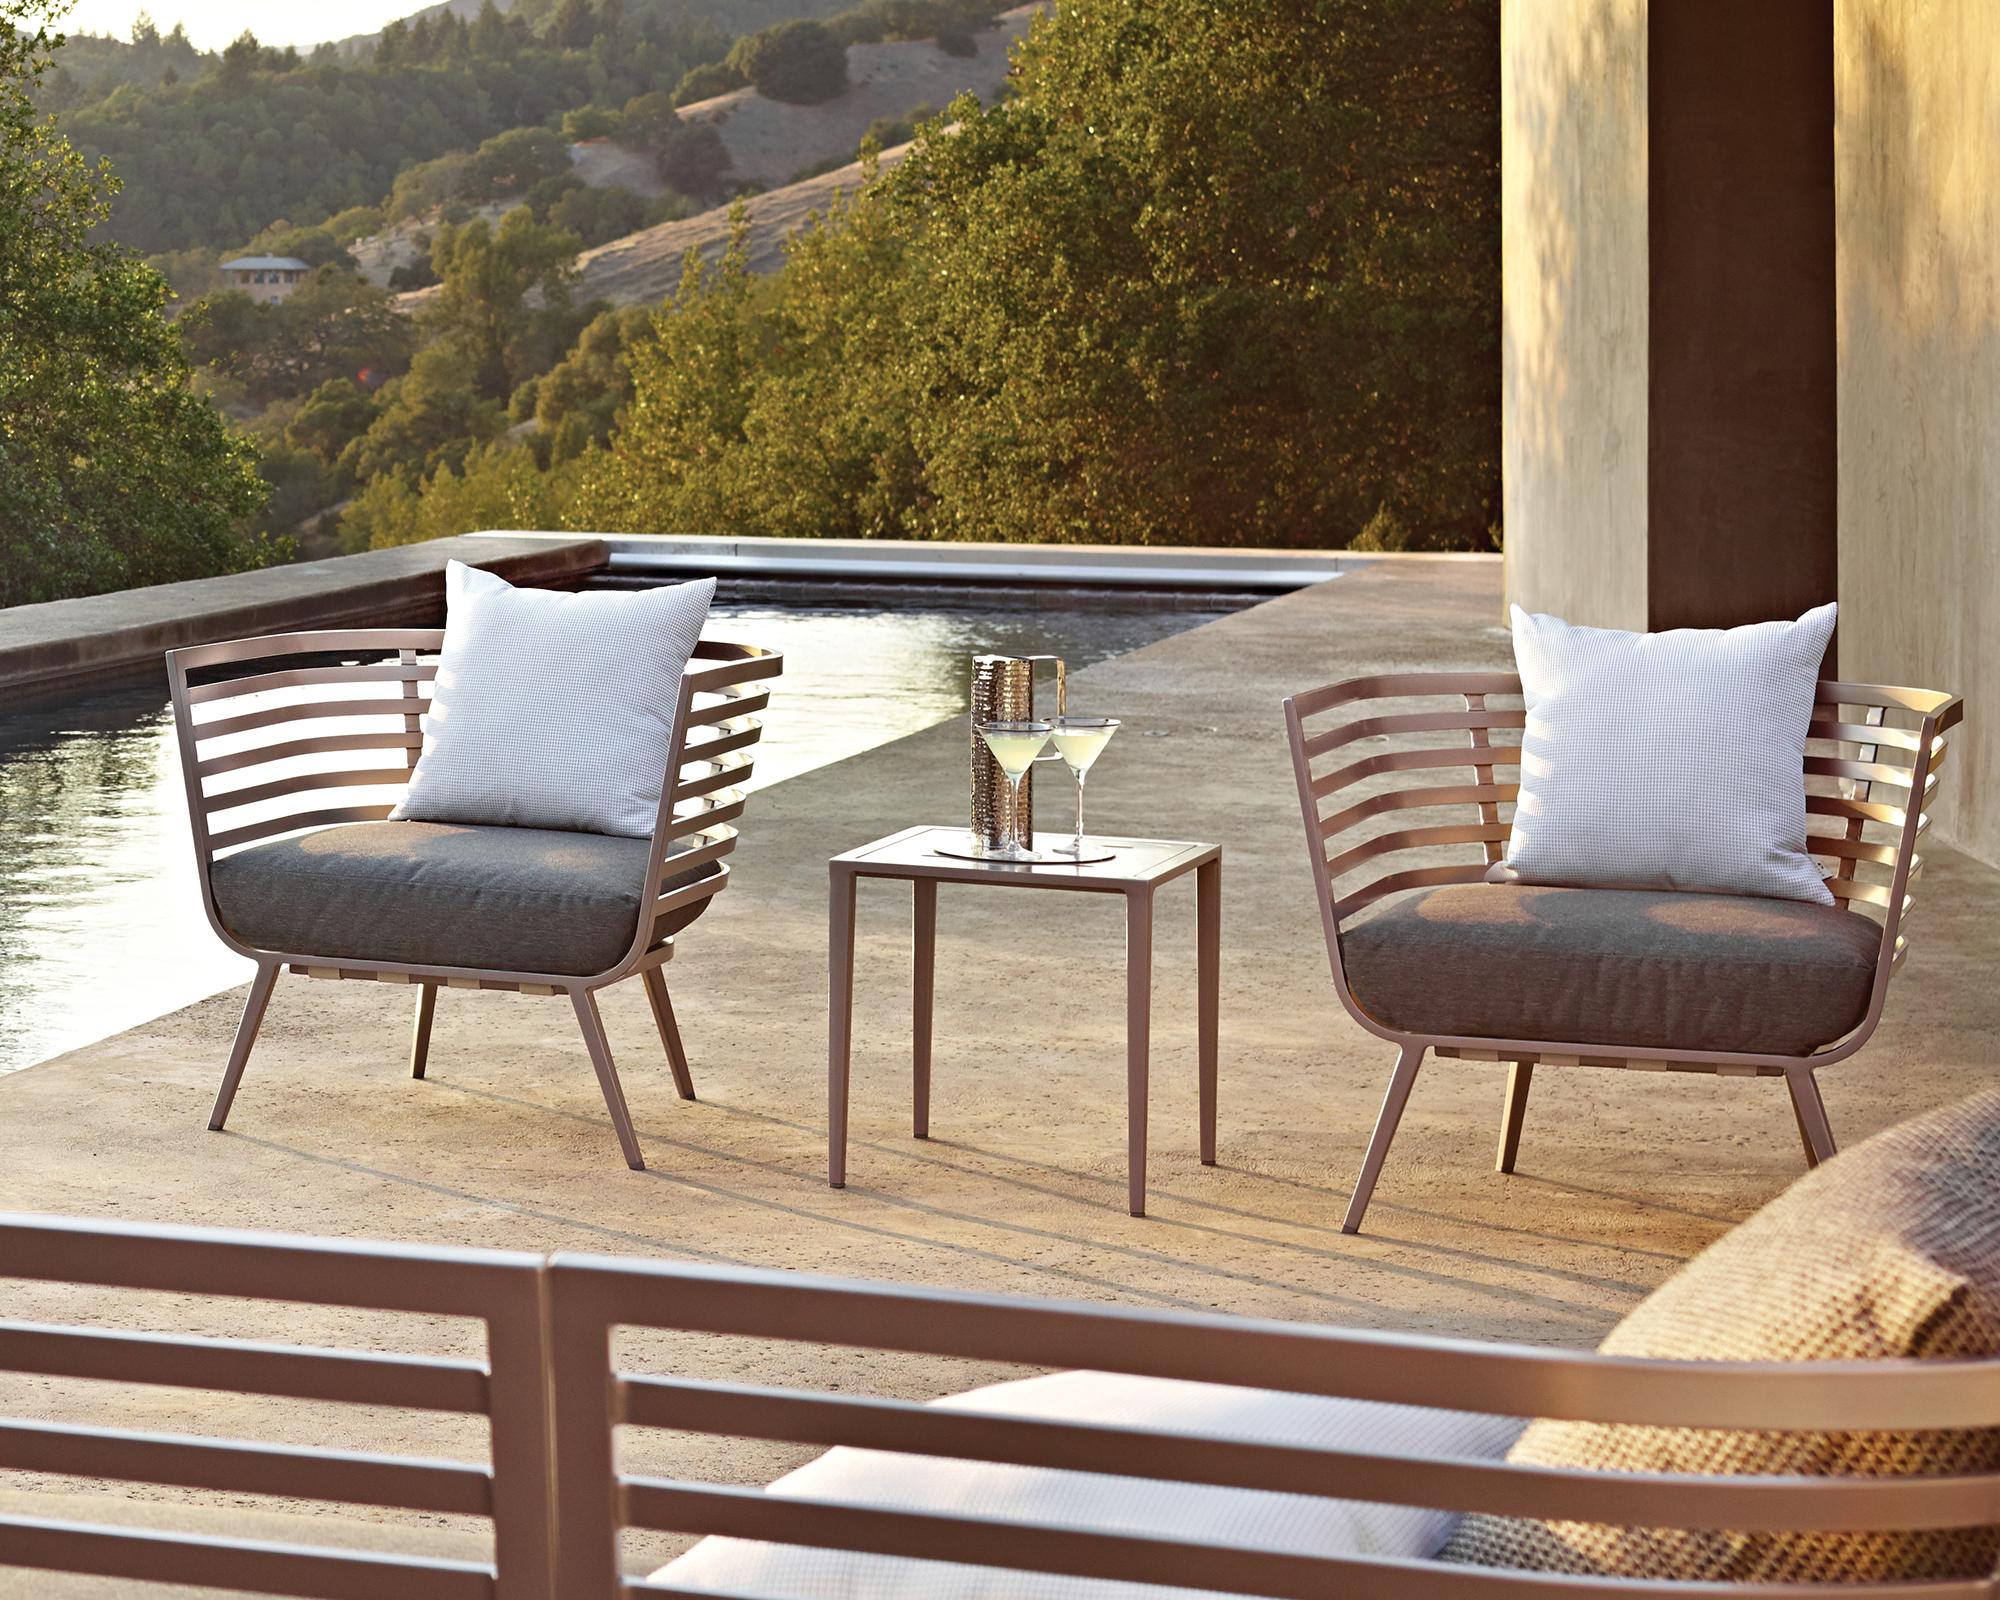 beistelltisch garten vista weiss online ausstellung. Black Bedroom Furniture Sets. Home Design Ideas